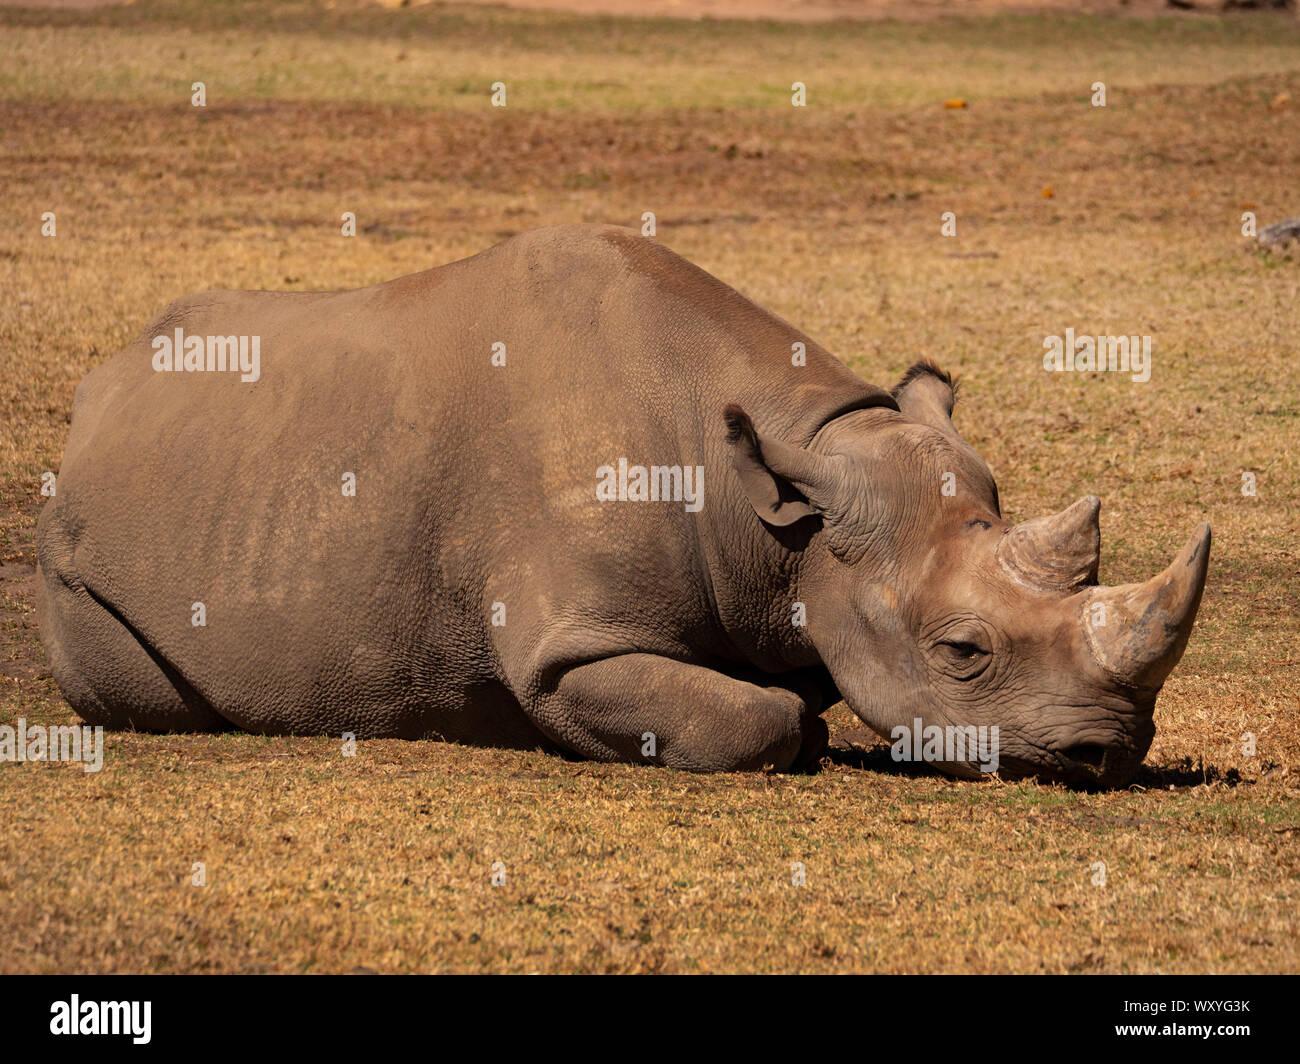 A critically endangered Black Rhinoceros, Diceros bicornis, in a captive breeding program resting in its enclosure. Stock Photo